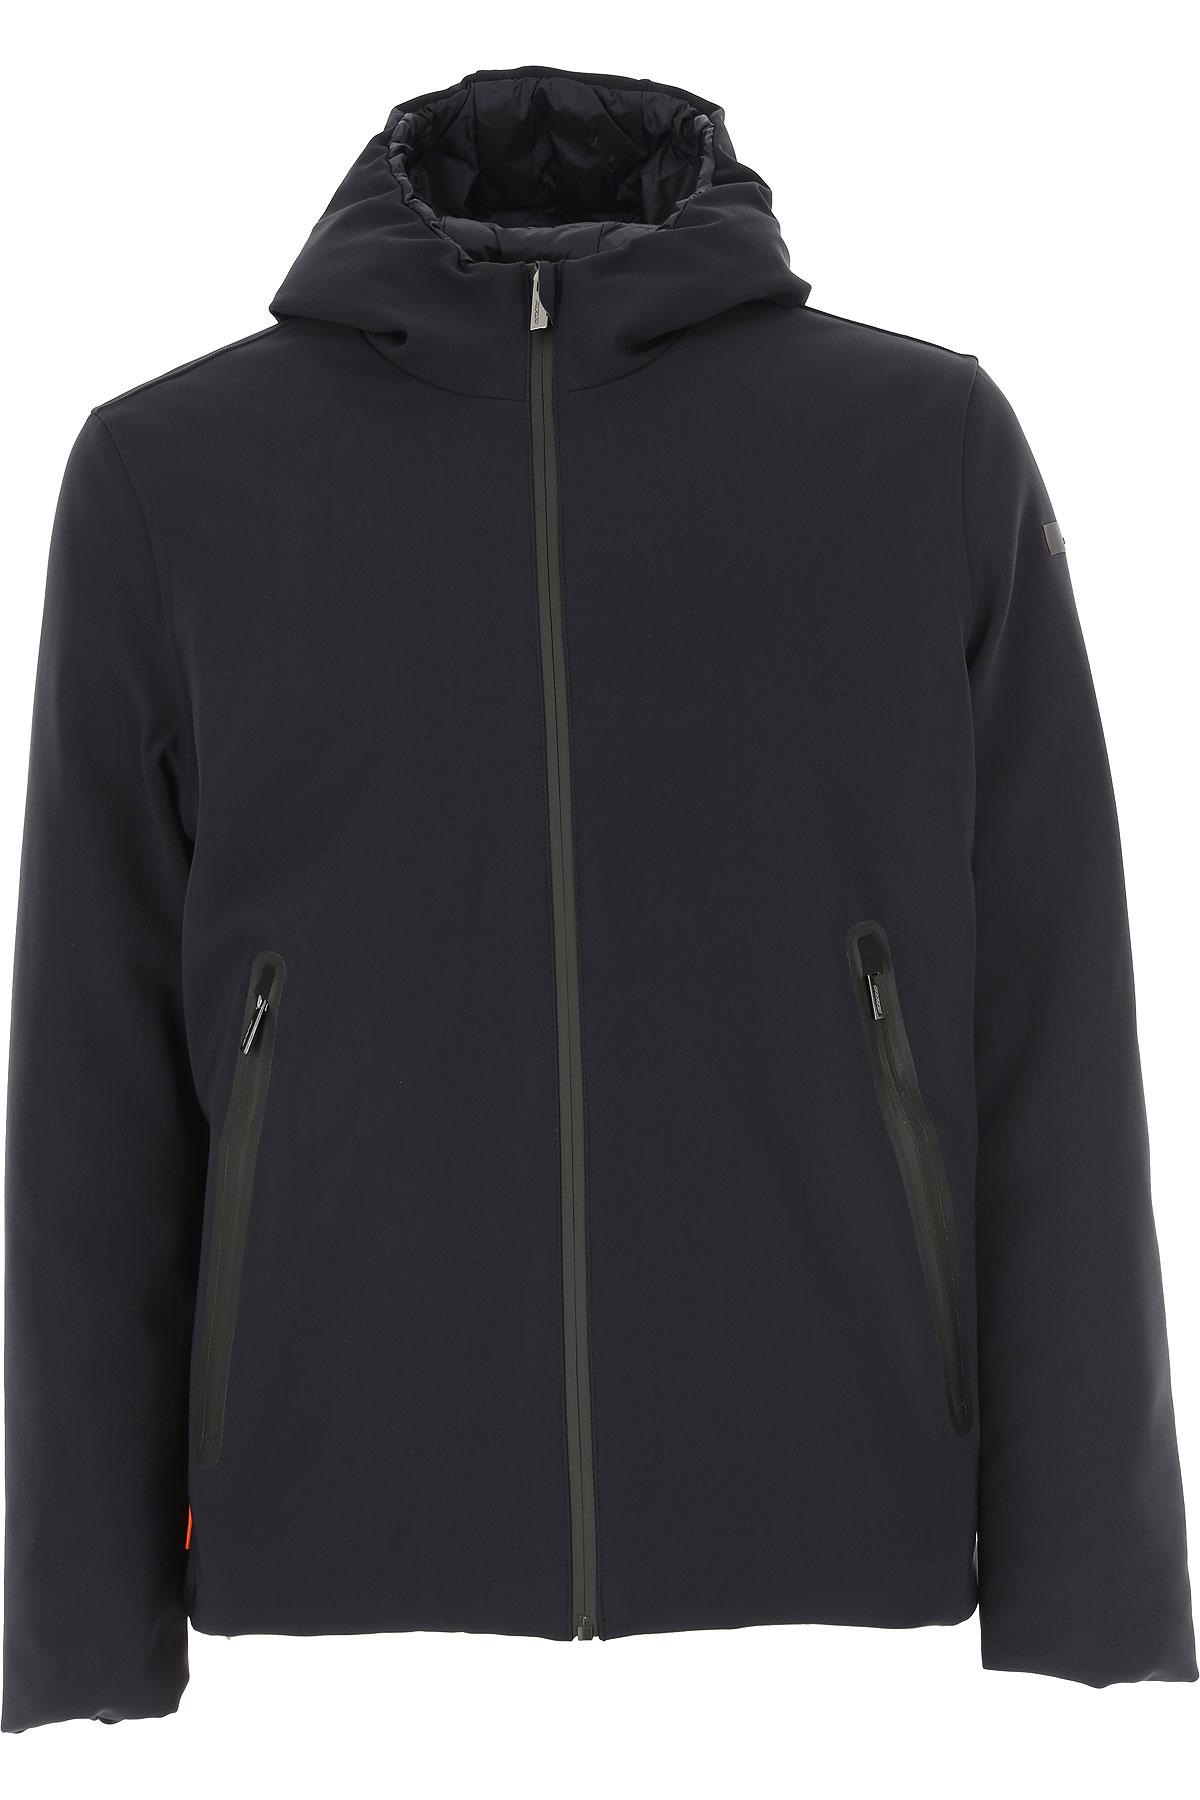 RRD Jacket for Men On Sale, Midnight Blue, polyamide, 2019, L M S XL XXL